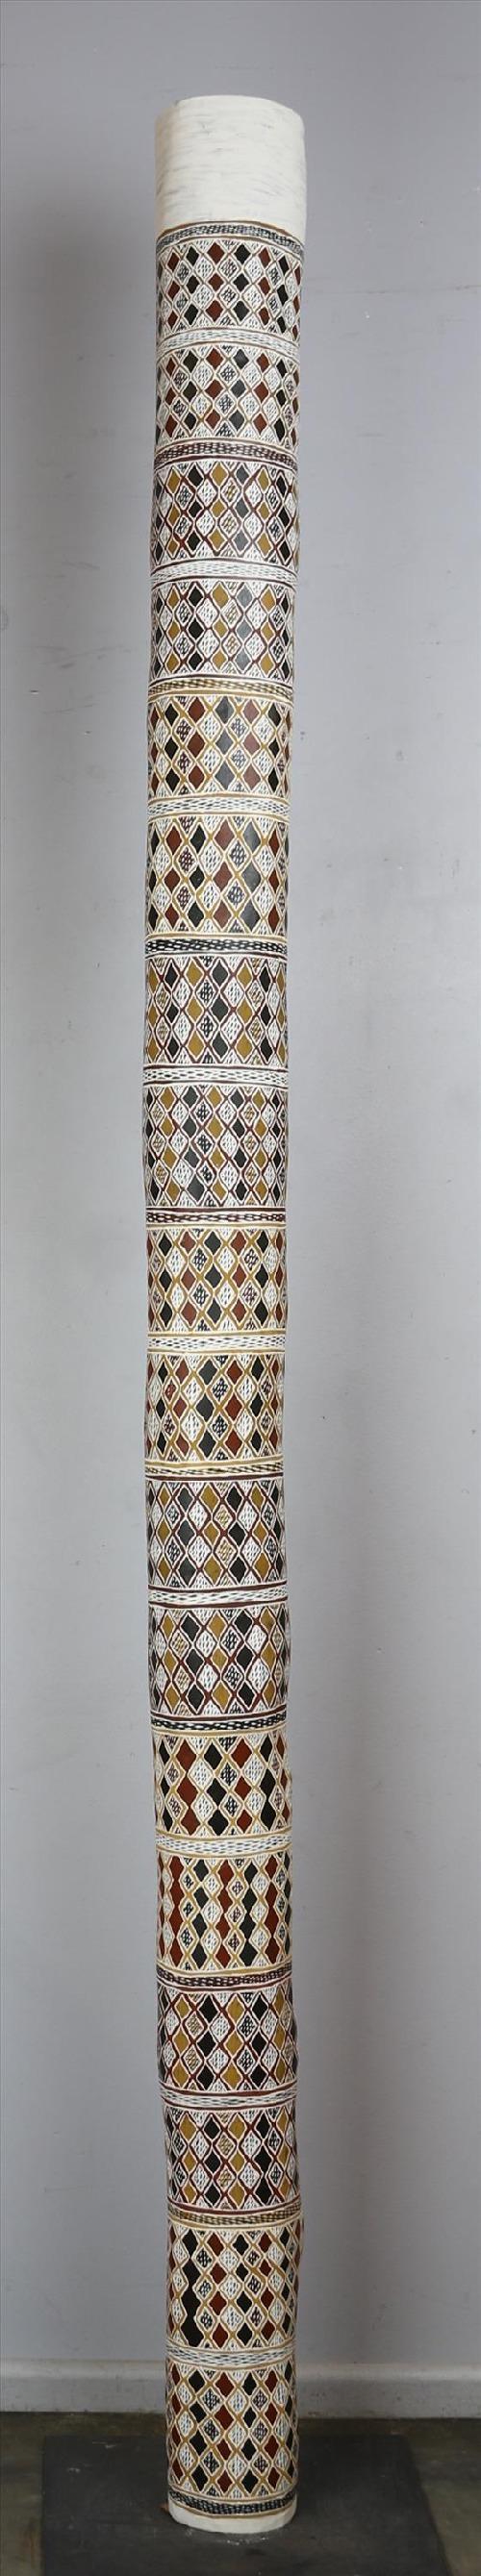 Gulutji - BUWBL4693-18